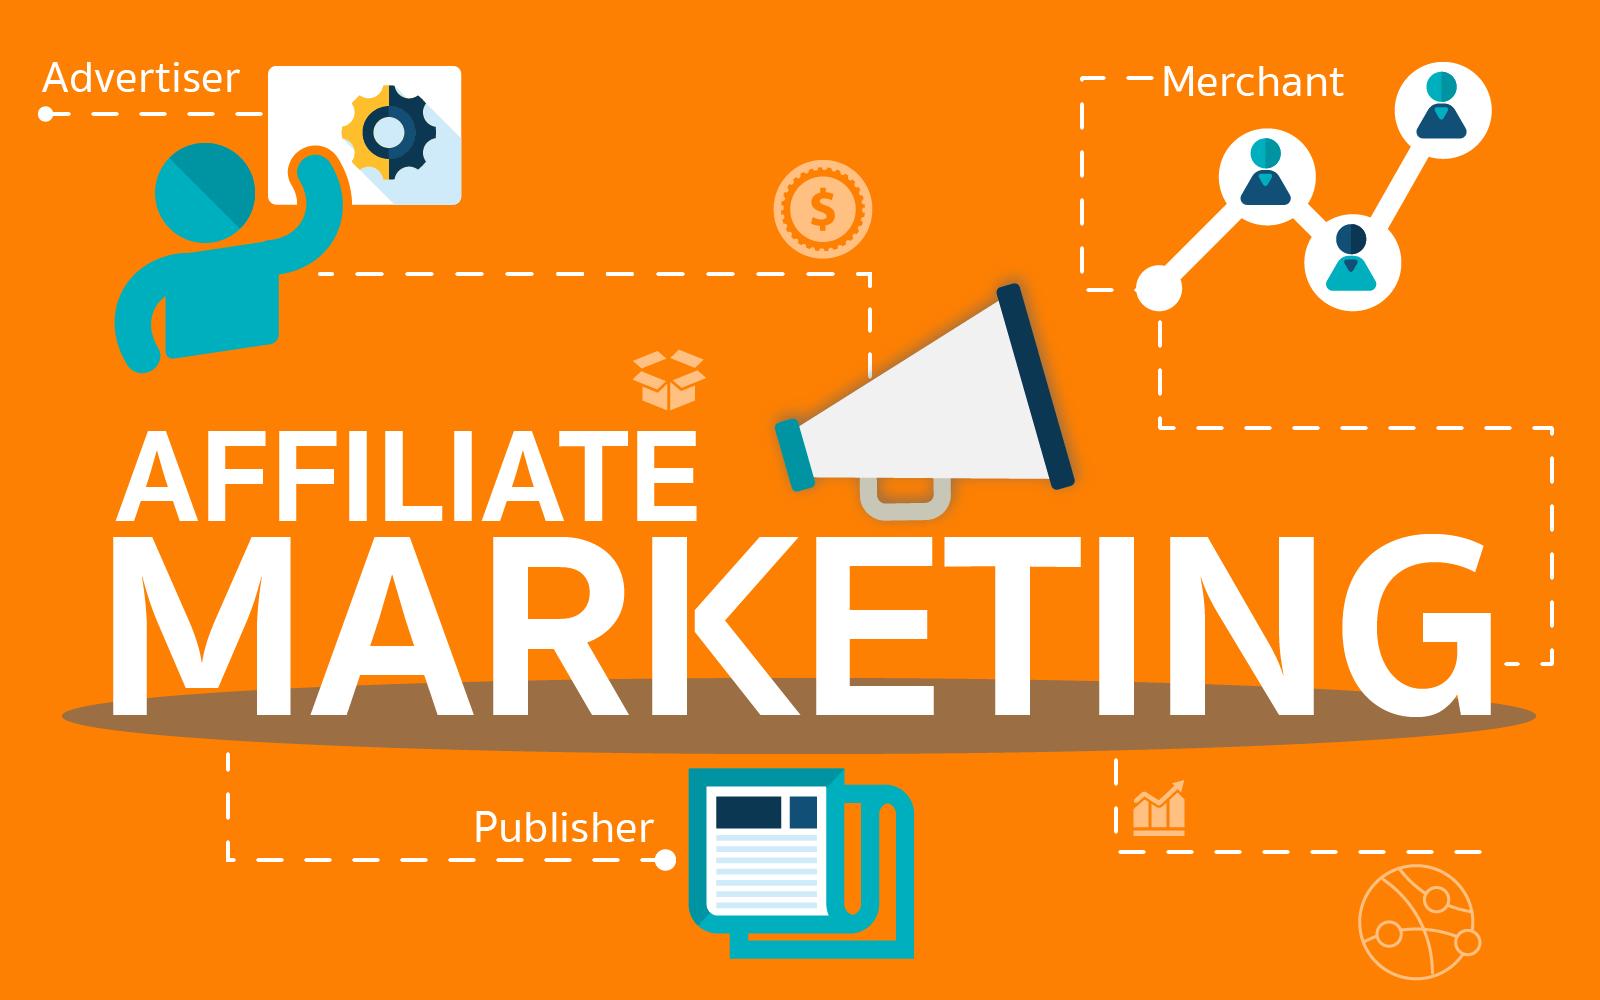 khoa-hoc-affiliate-marketing-hieu-qua-chat-luong.